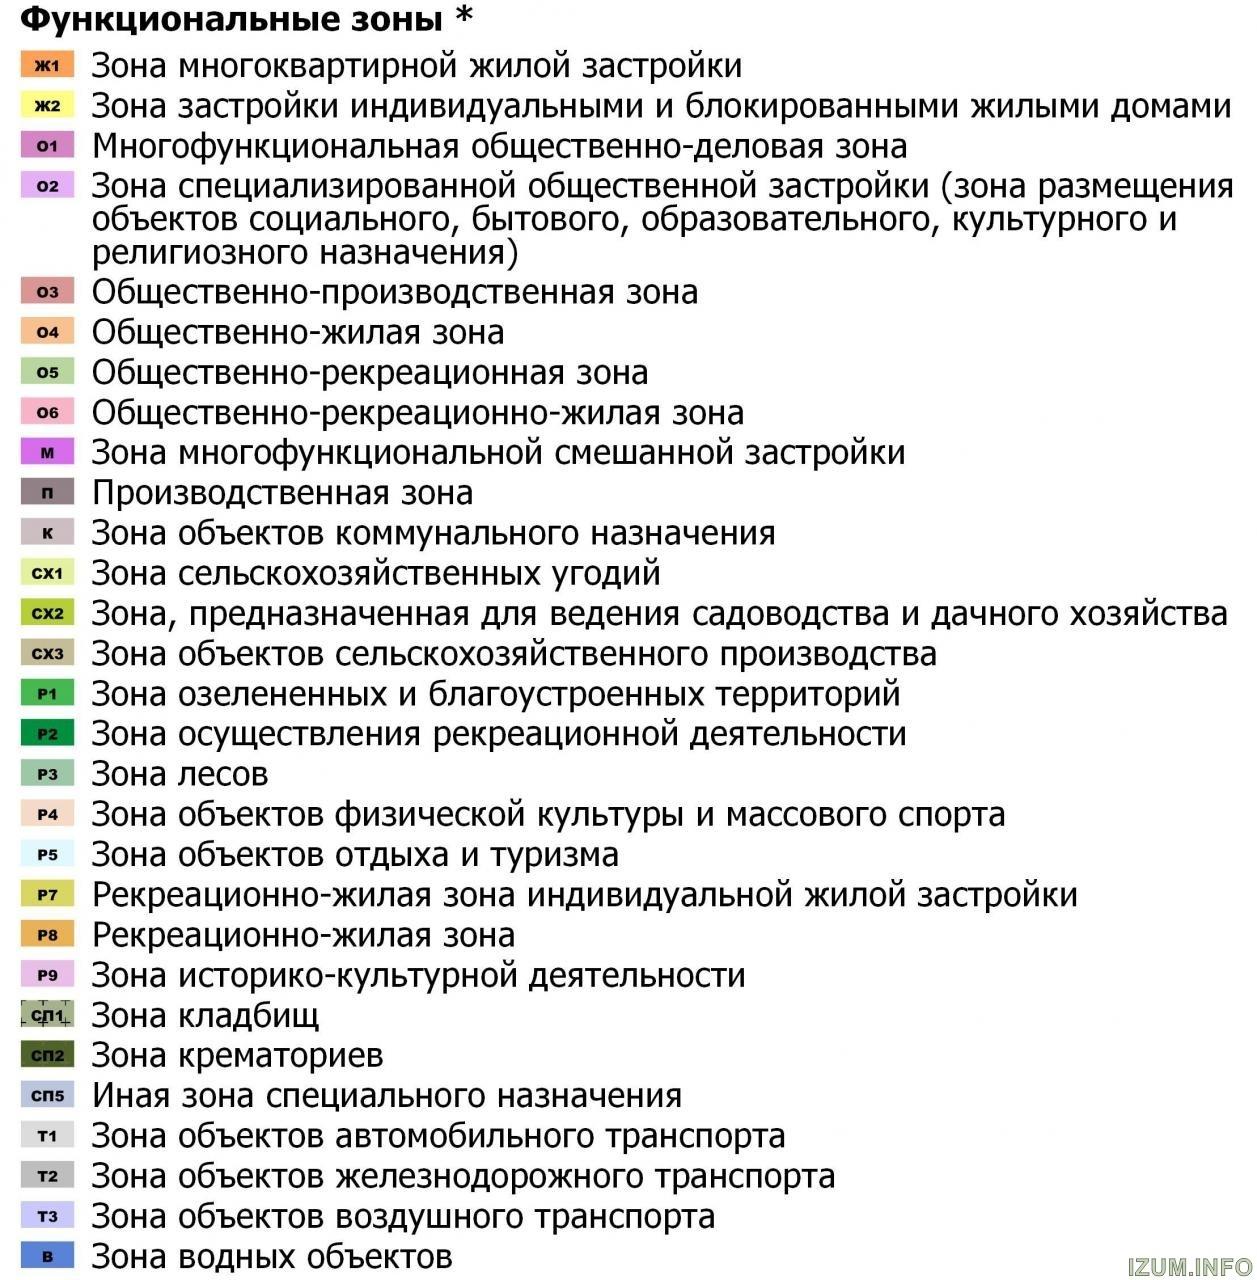 ГО Красногорск_карта ФЗ2.jpg